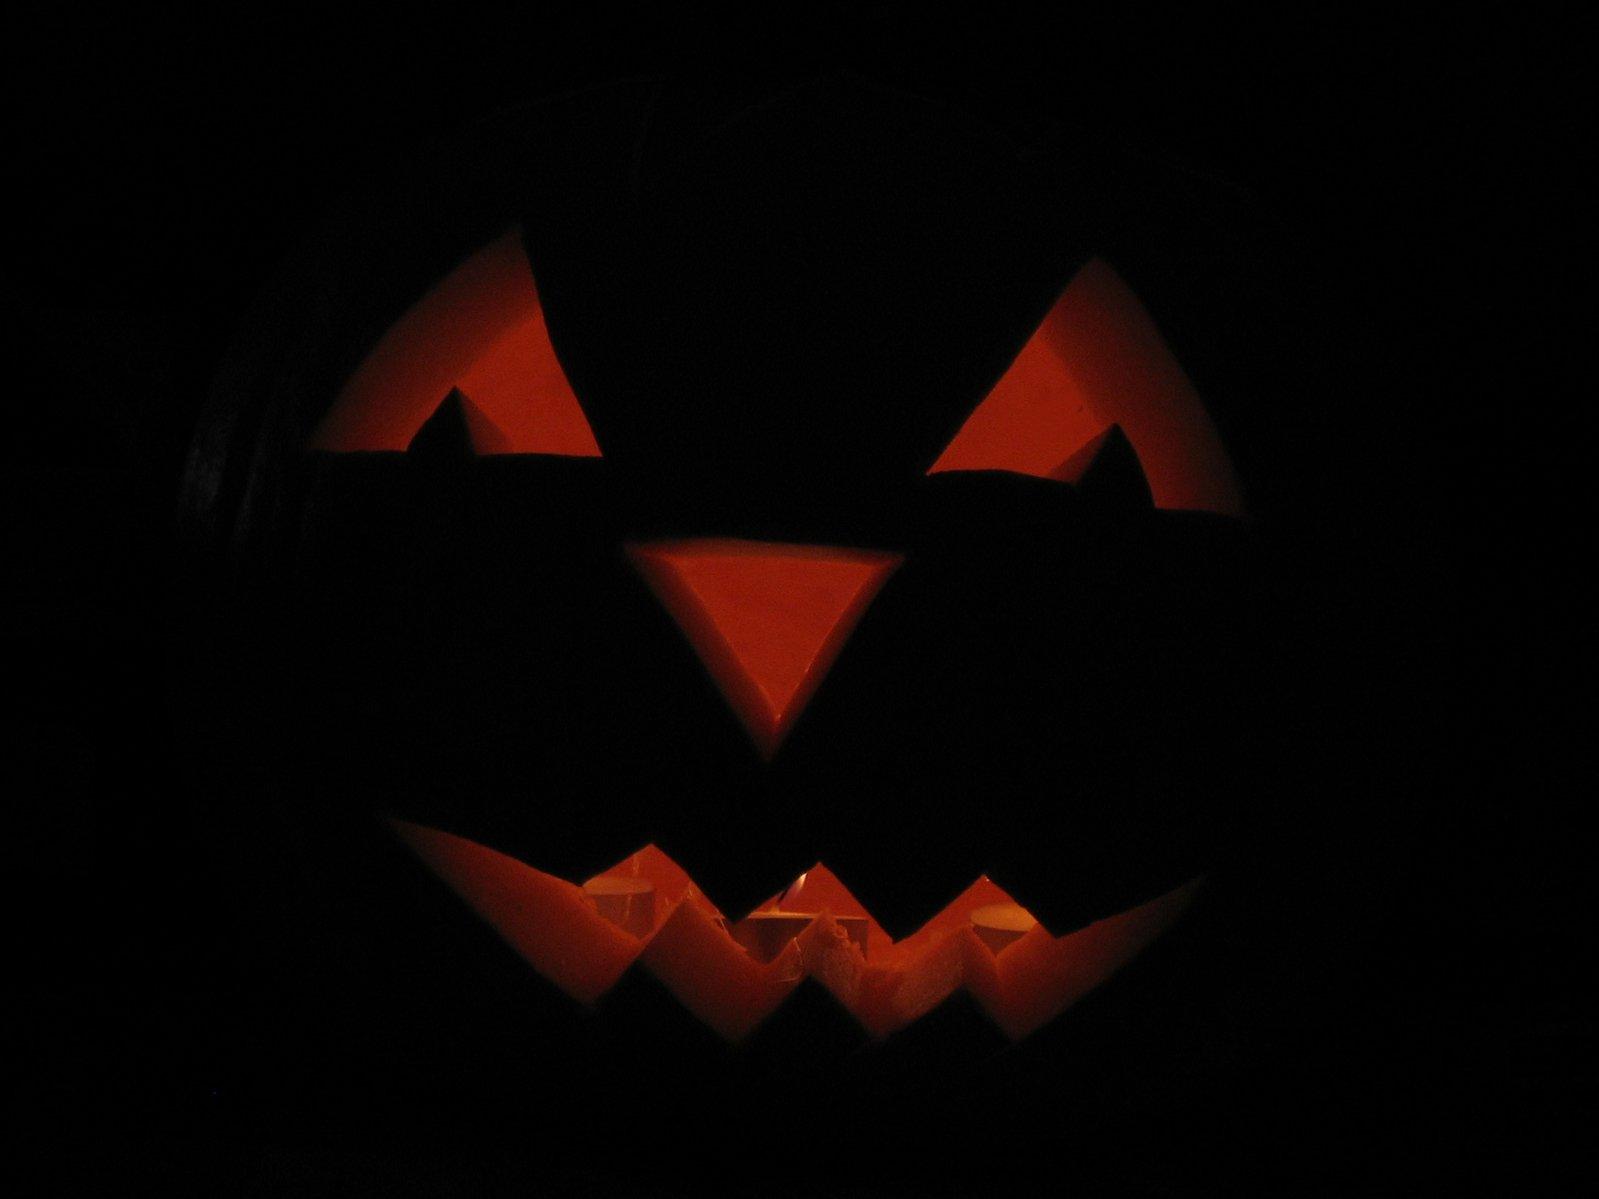 jack-o-lantern-1443307.jpg